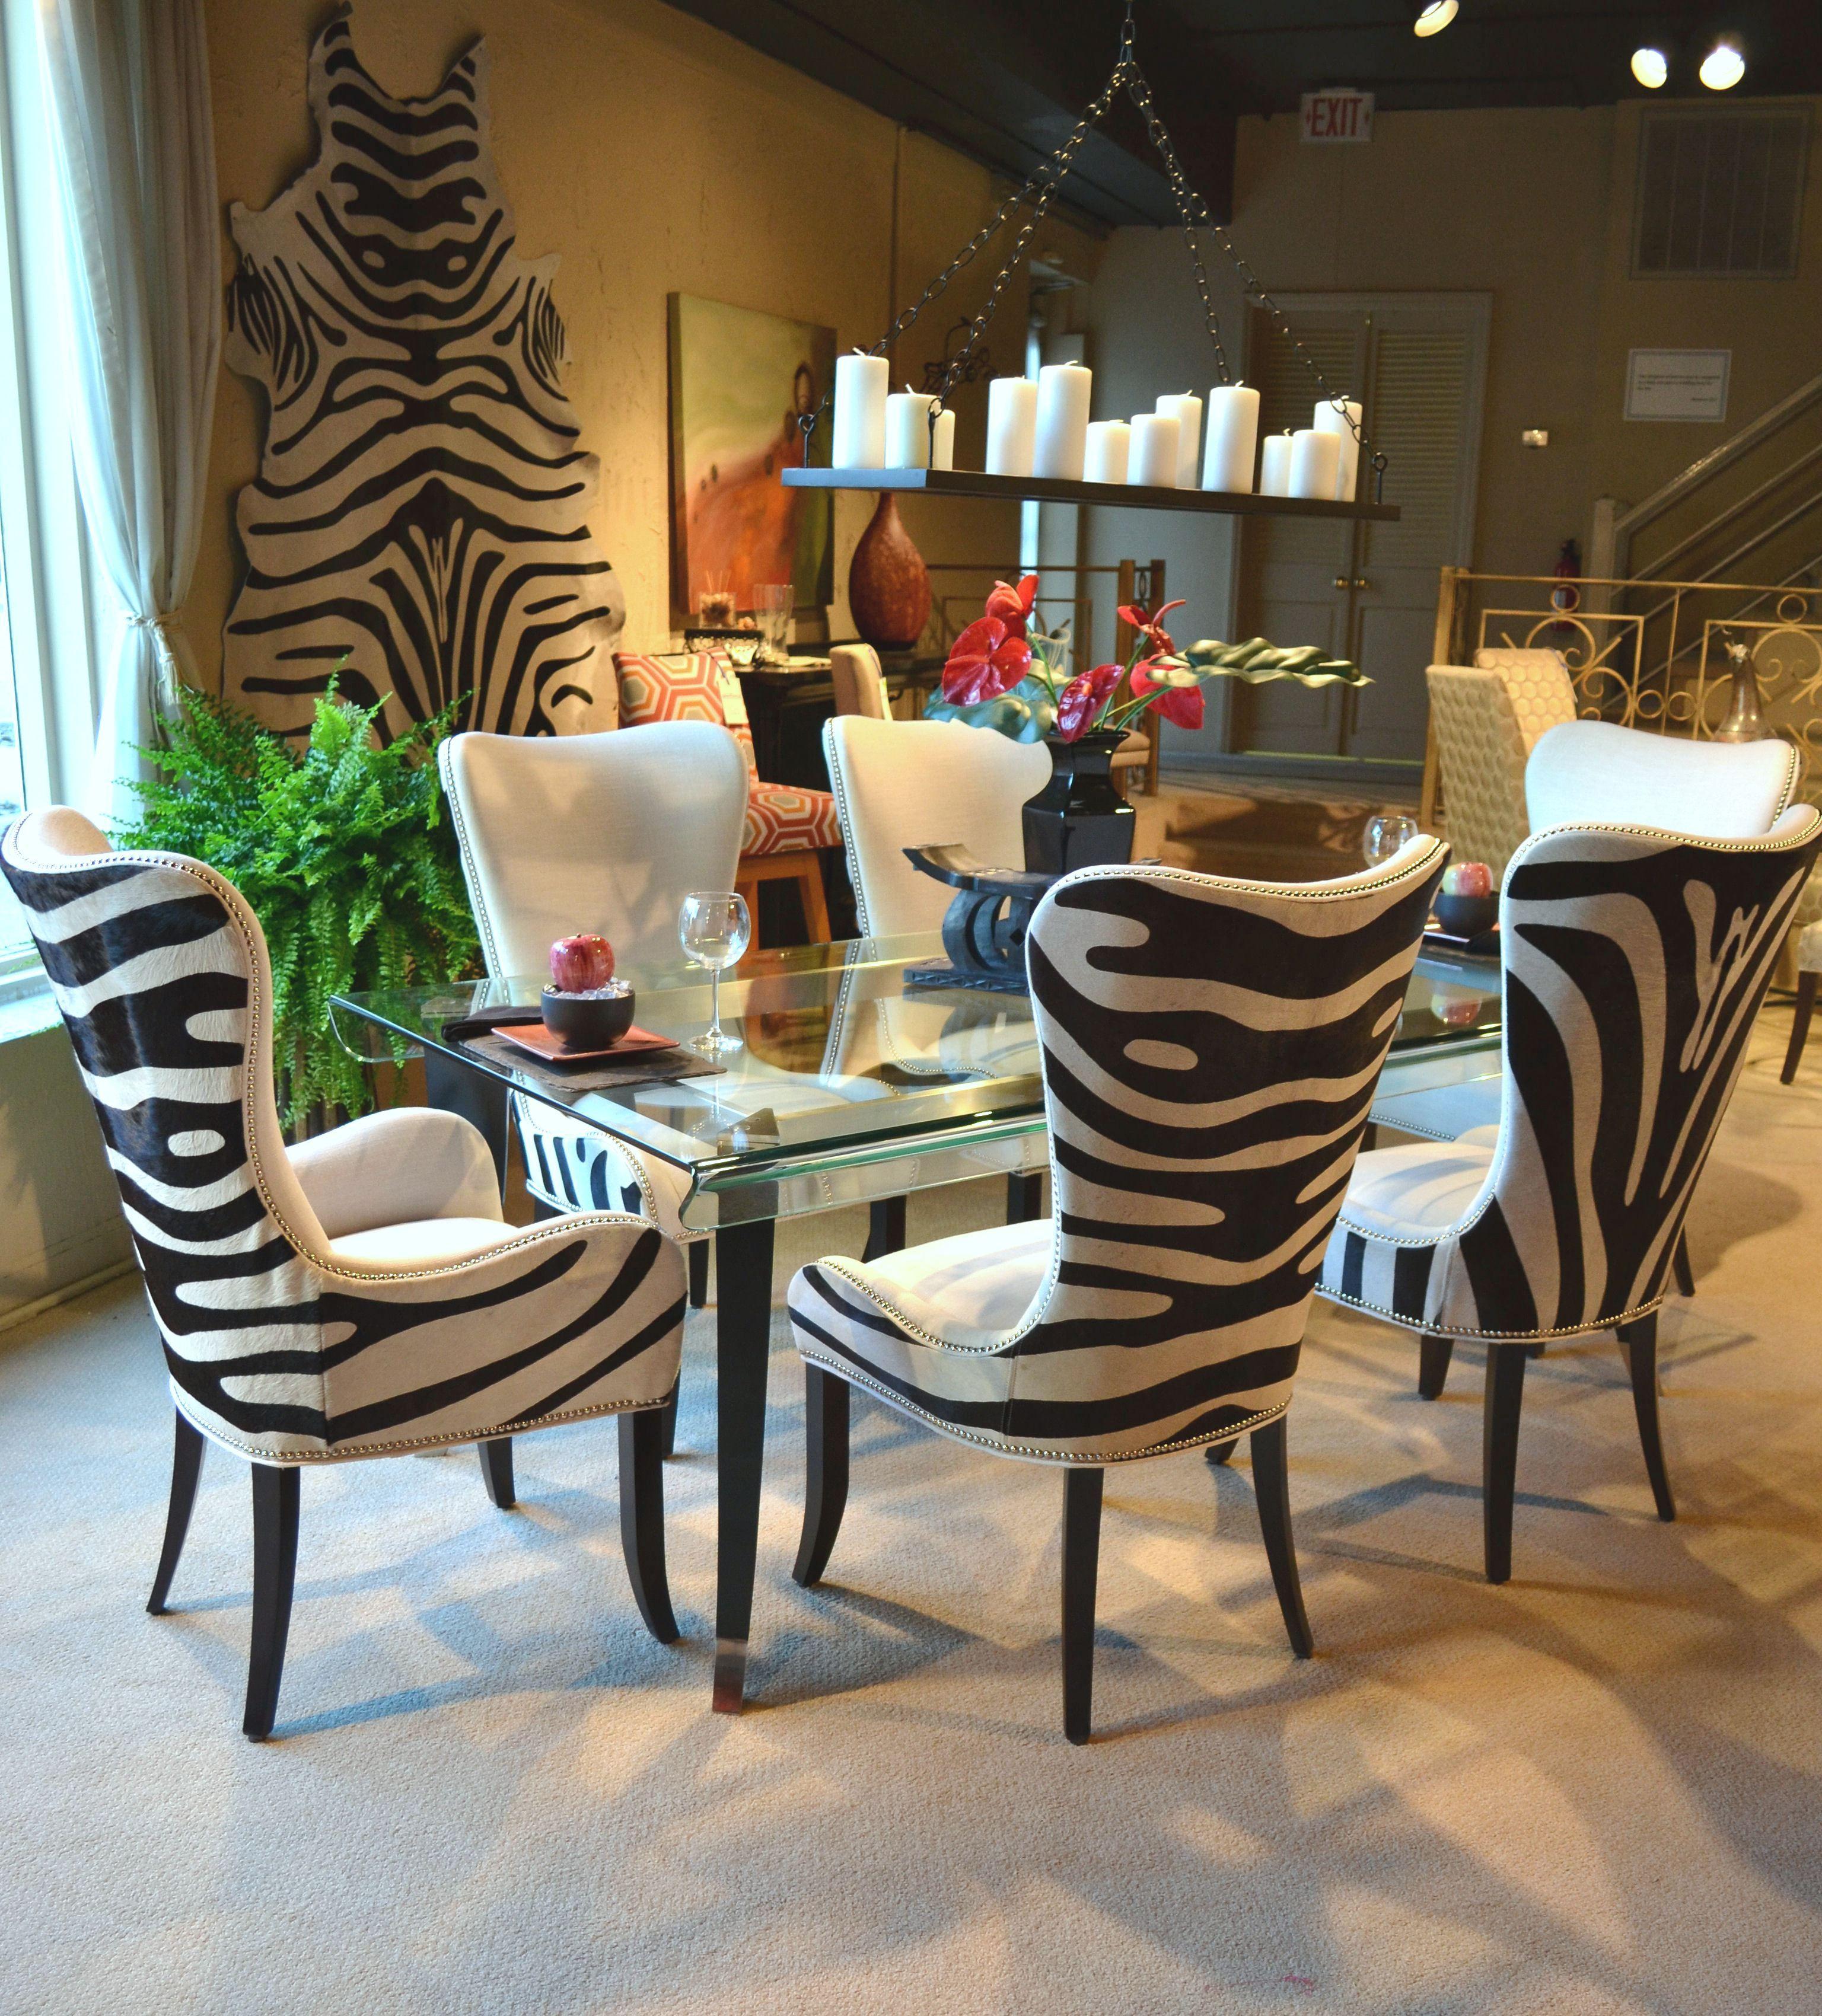 Beau Designmaster Denmark Chairs In Zebra Hair On Hide #Designmaster Furniture